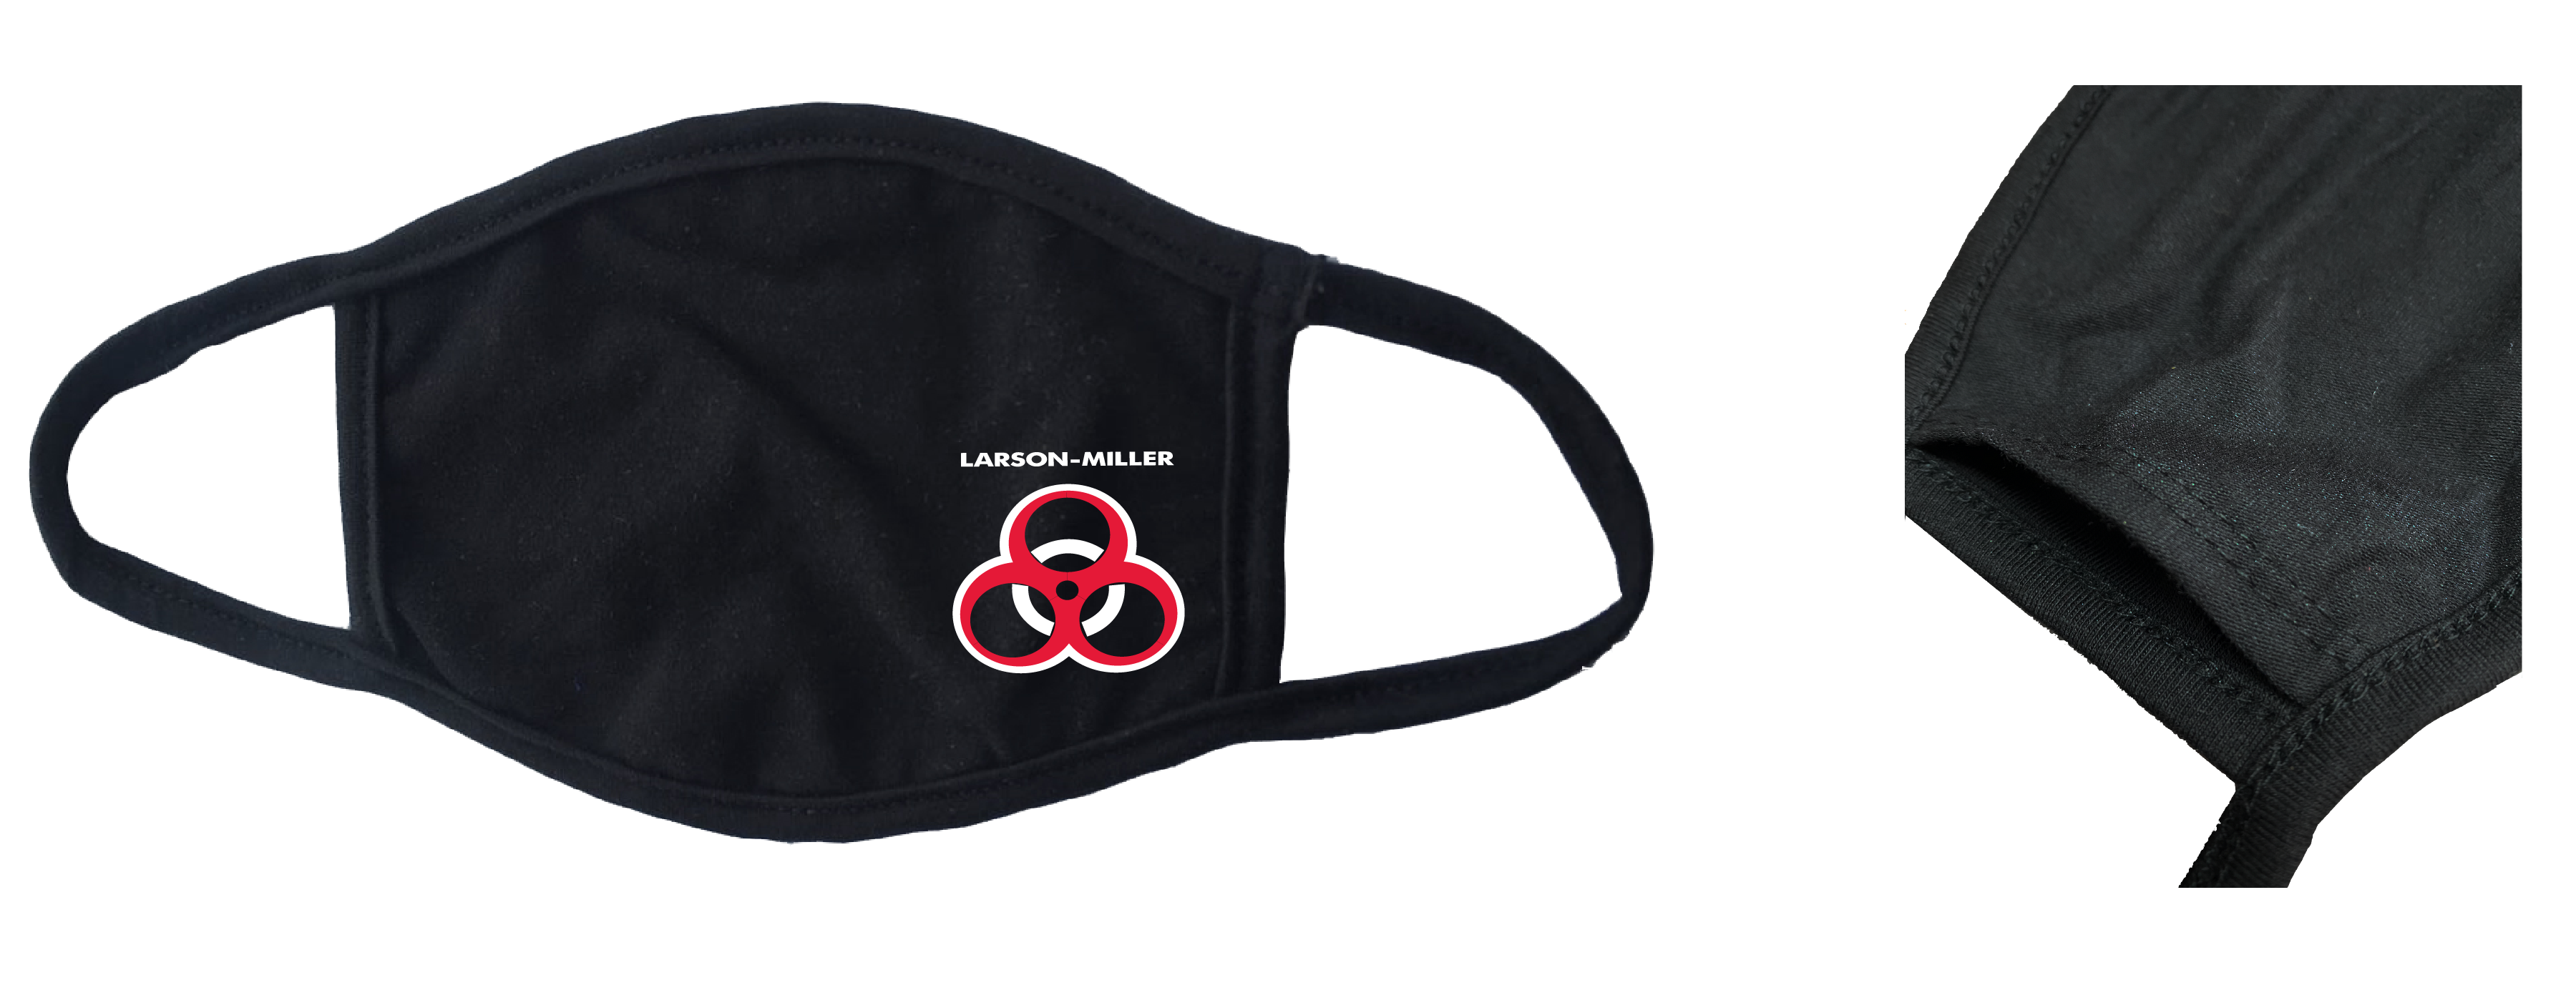 Custom printed black mask